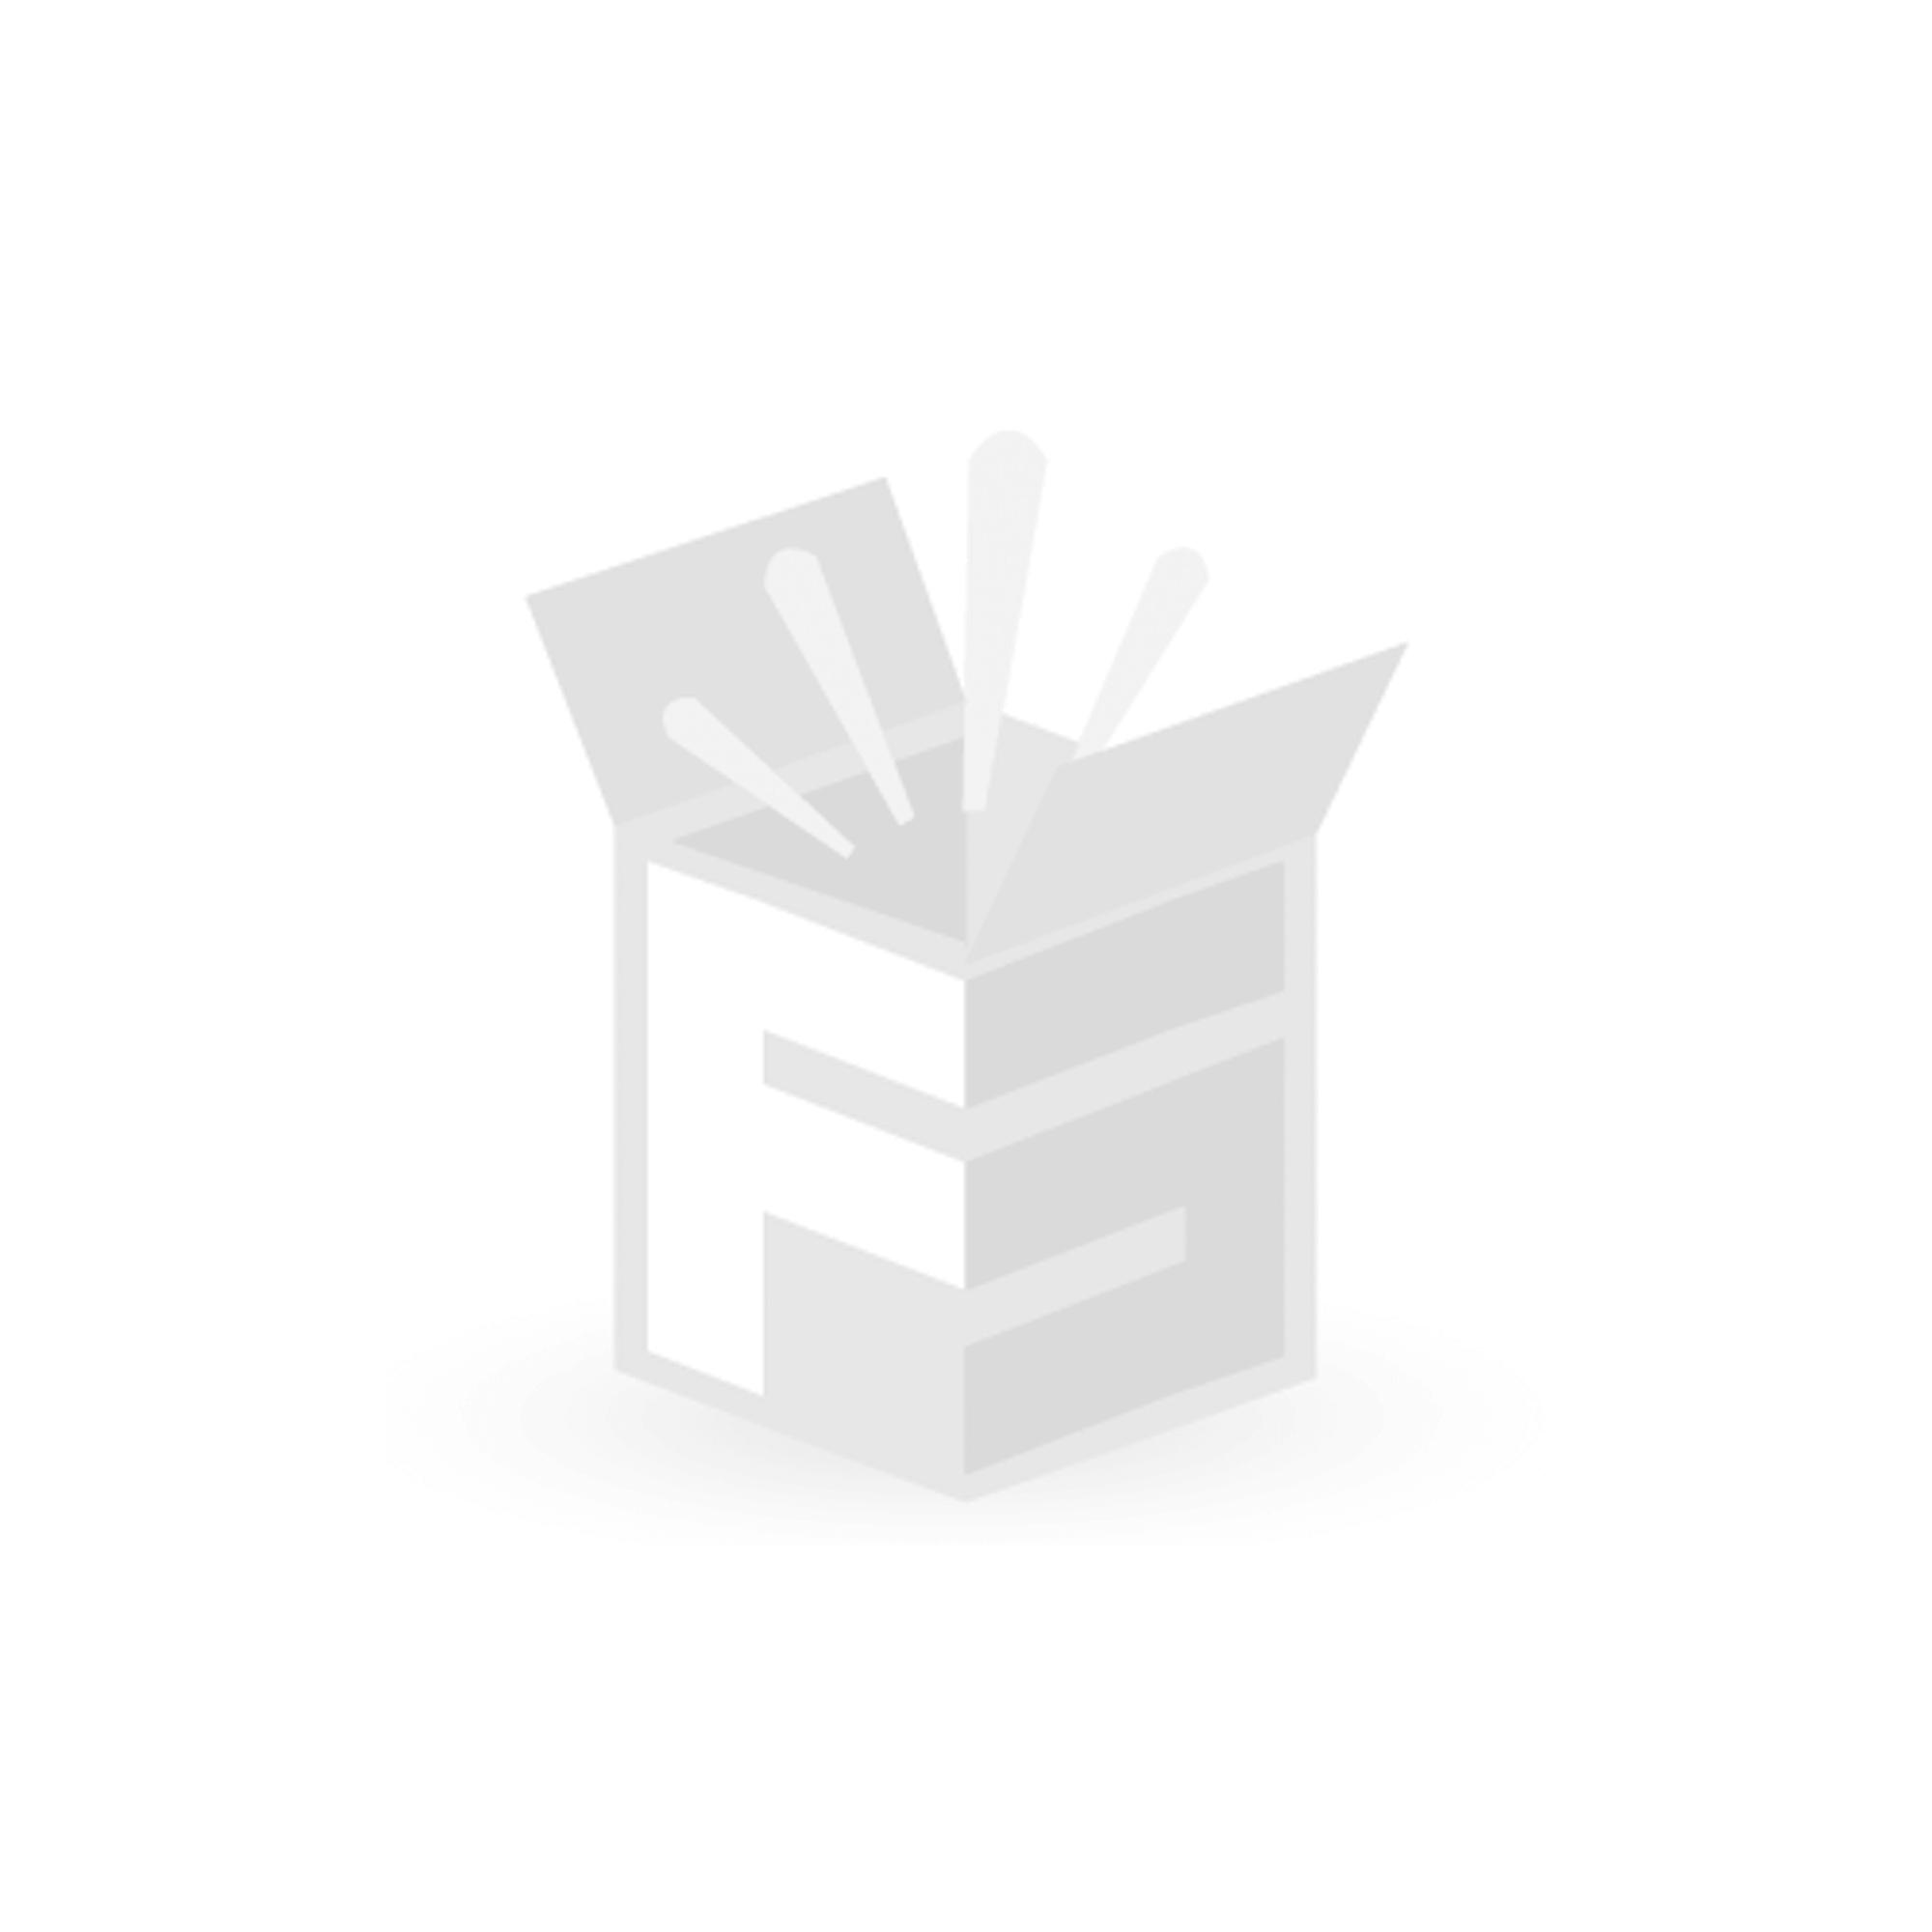 Everlast Boxbandagen 275 cm, 2 Stück